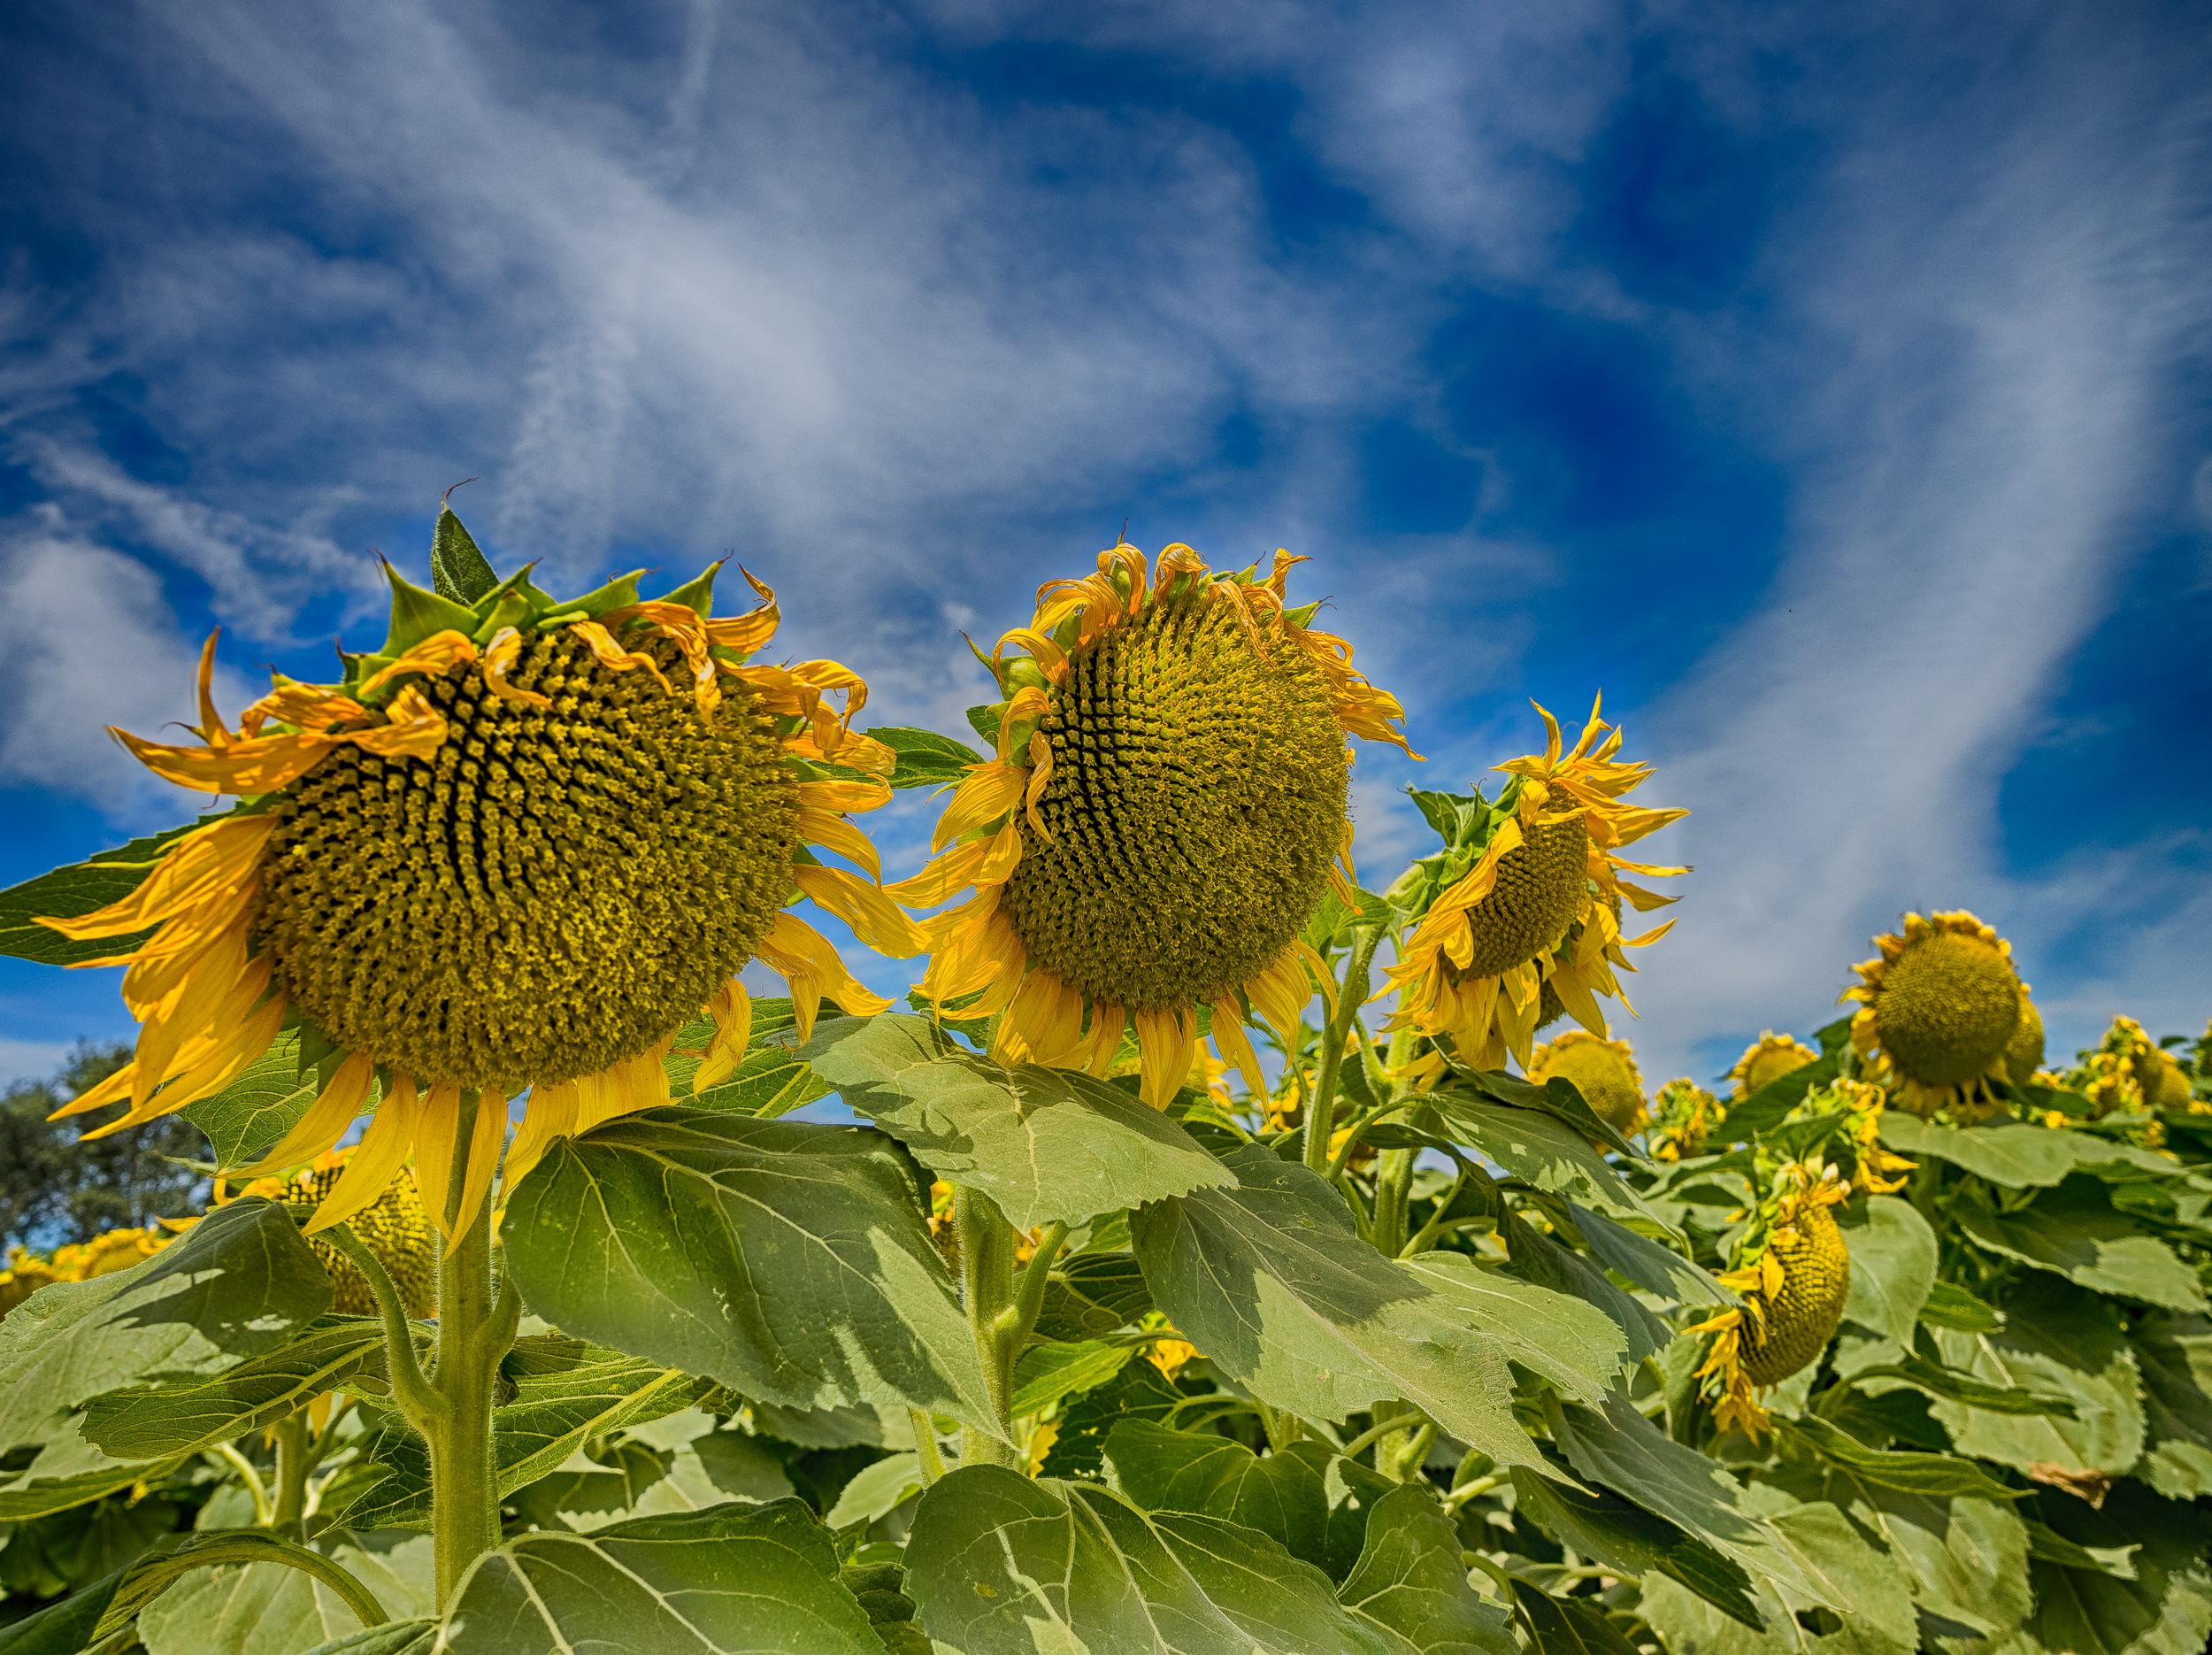 Sunflowers-24_HDR.jpg